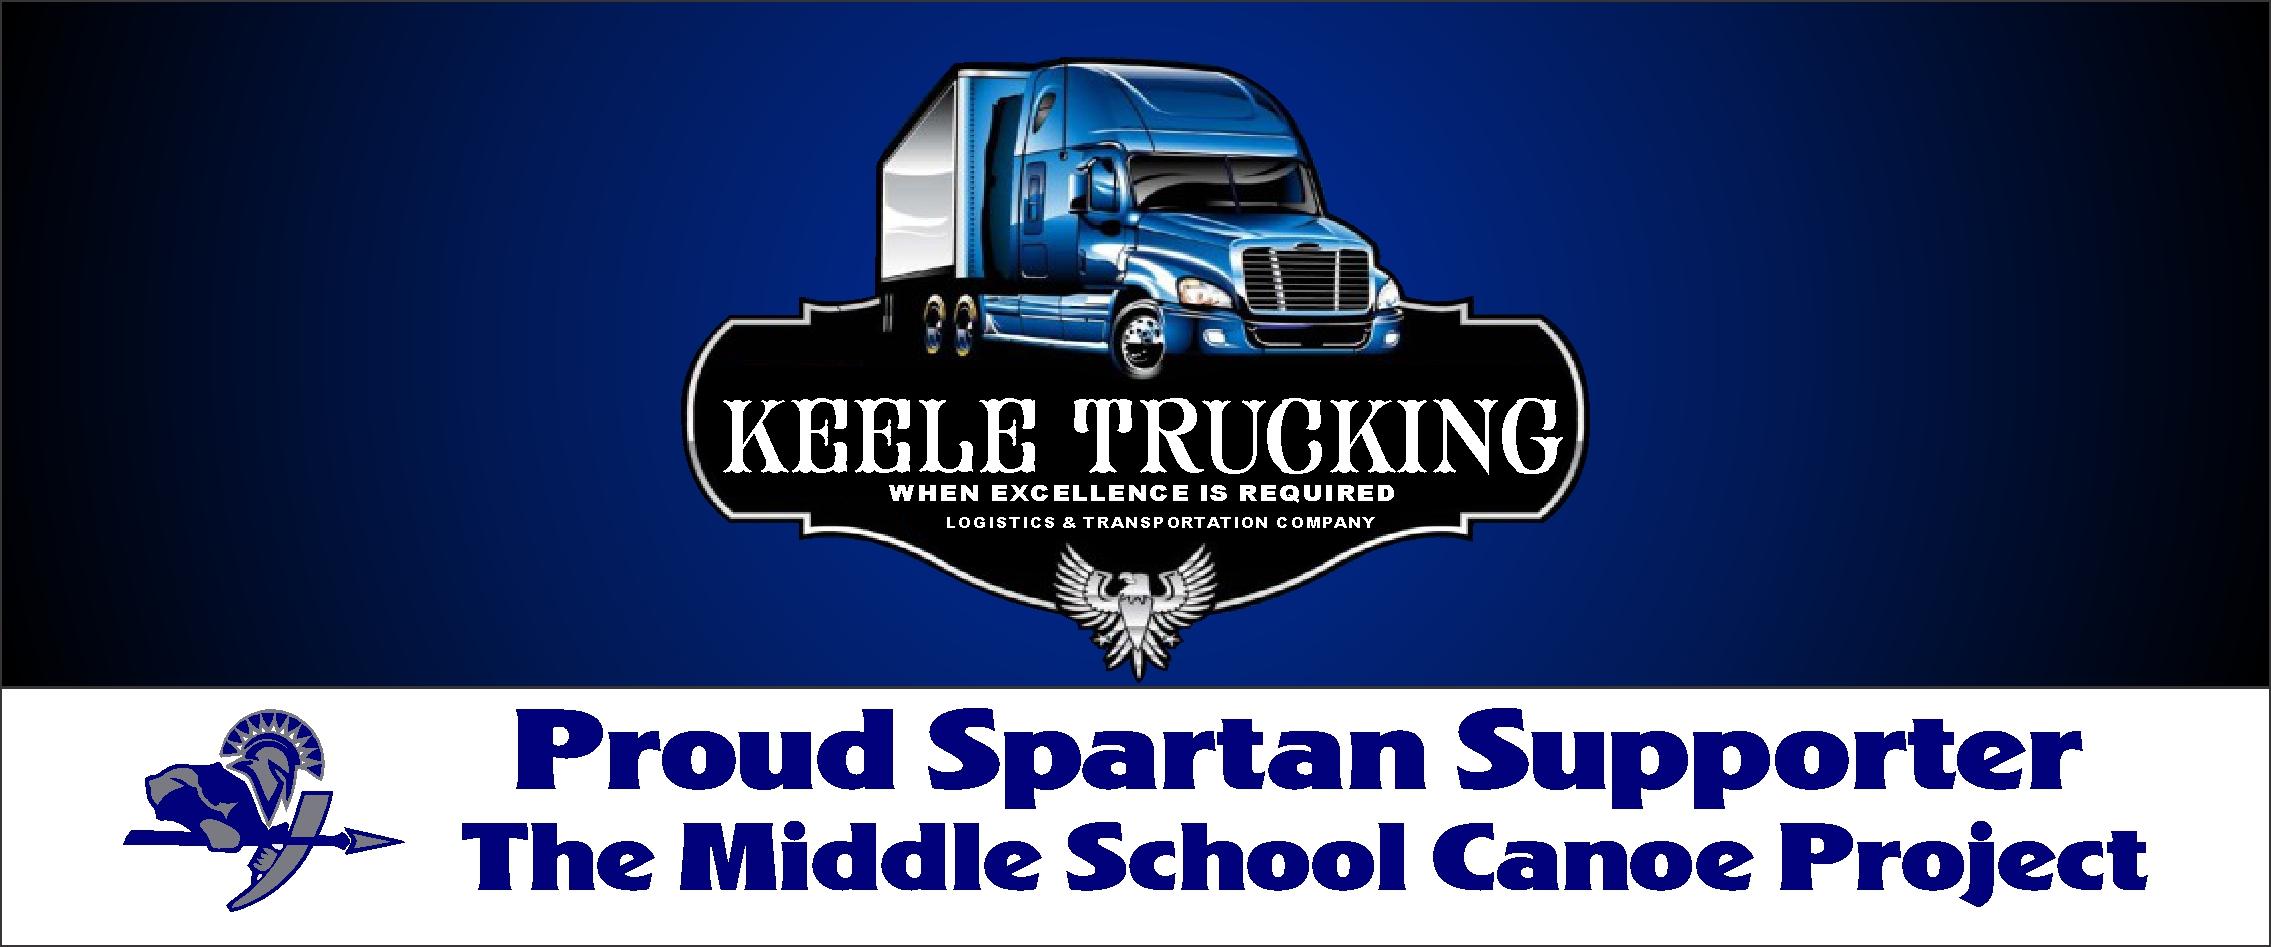 Keele Trucking logo picture